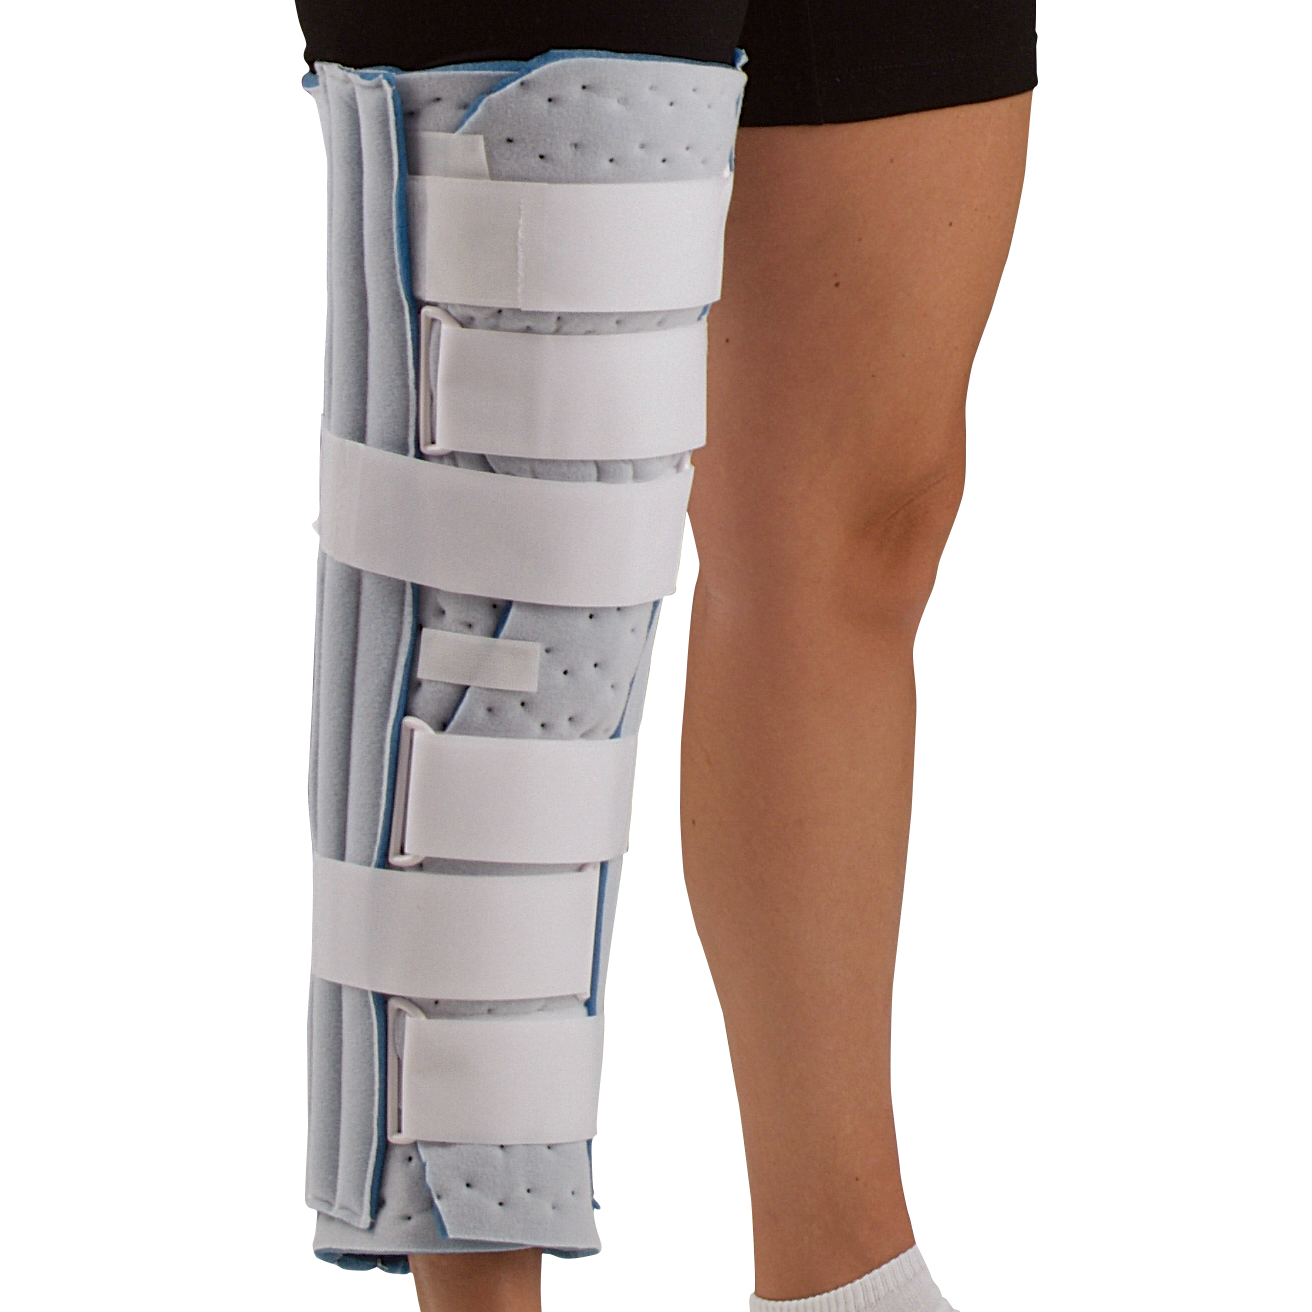 d9be37d835 Cutaway Knee Immobilizer